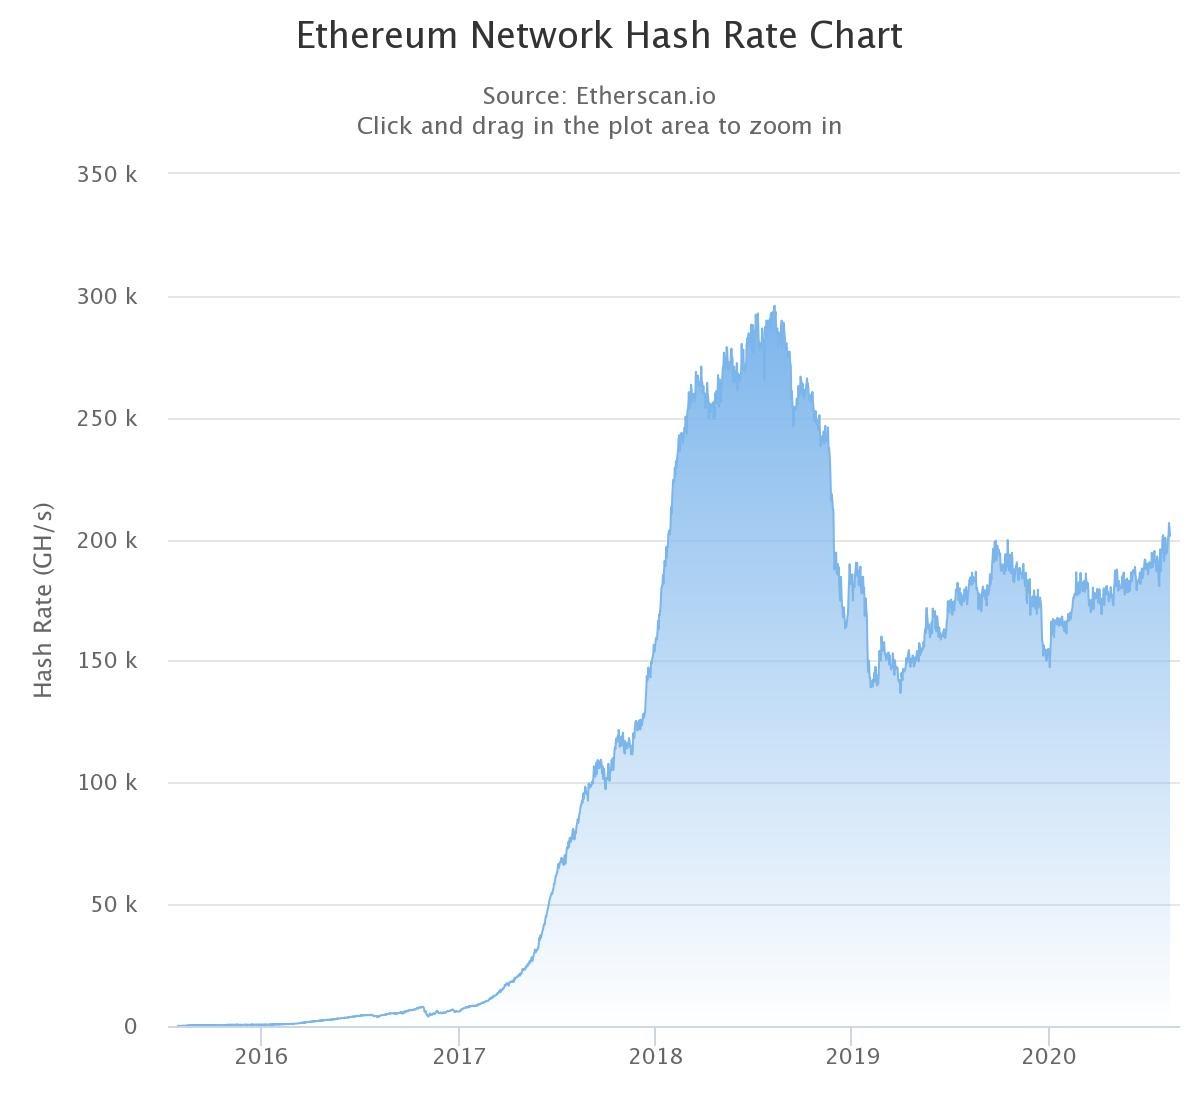 Ethereum network hashrate rises to 2018 levels